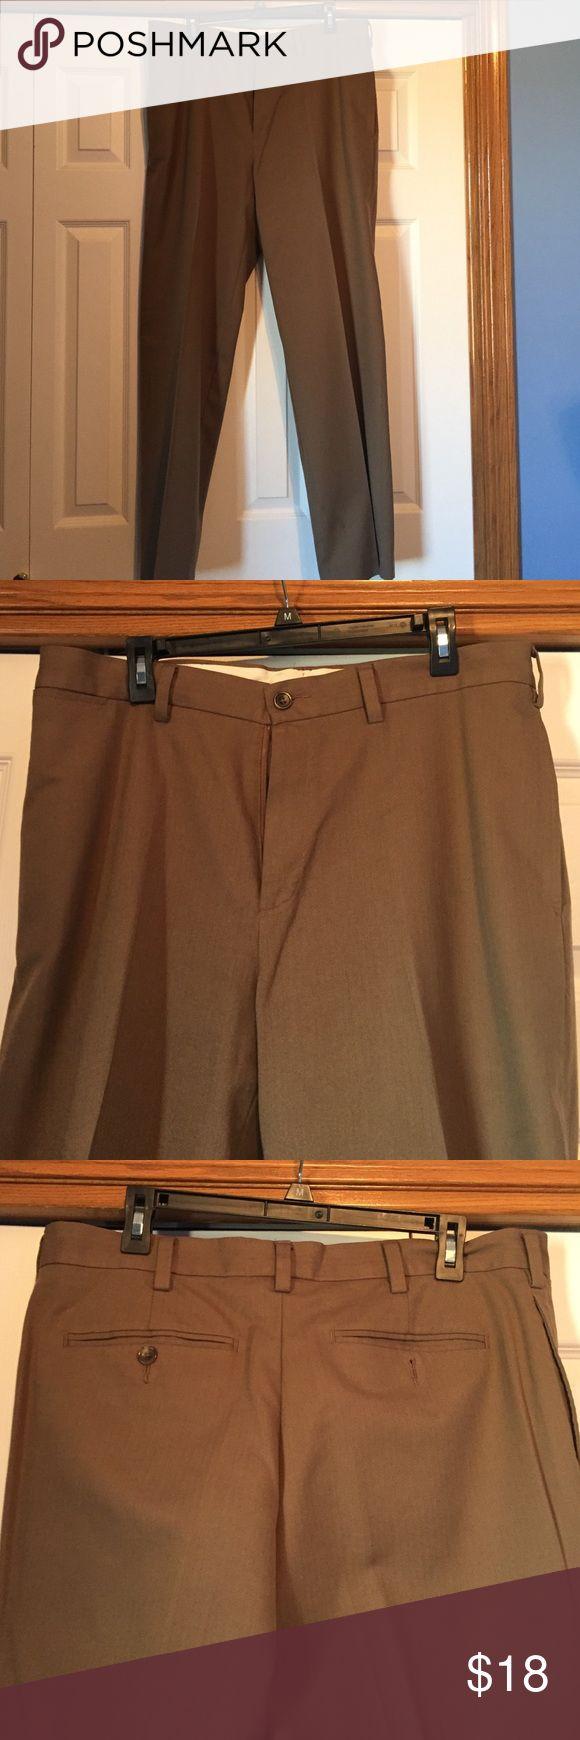 Men's Tan Eddie Bauer slacks 100% cotton AG Eddie Bauer Pants Dress